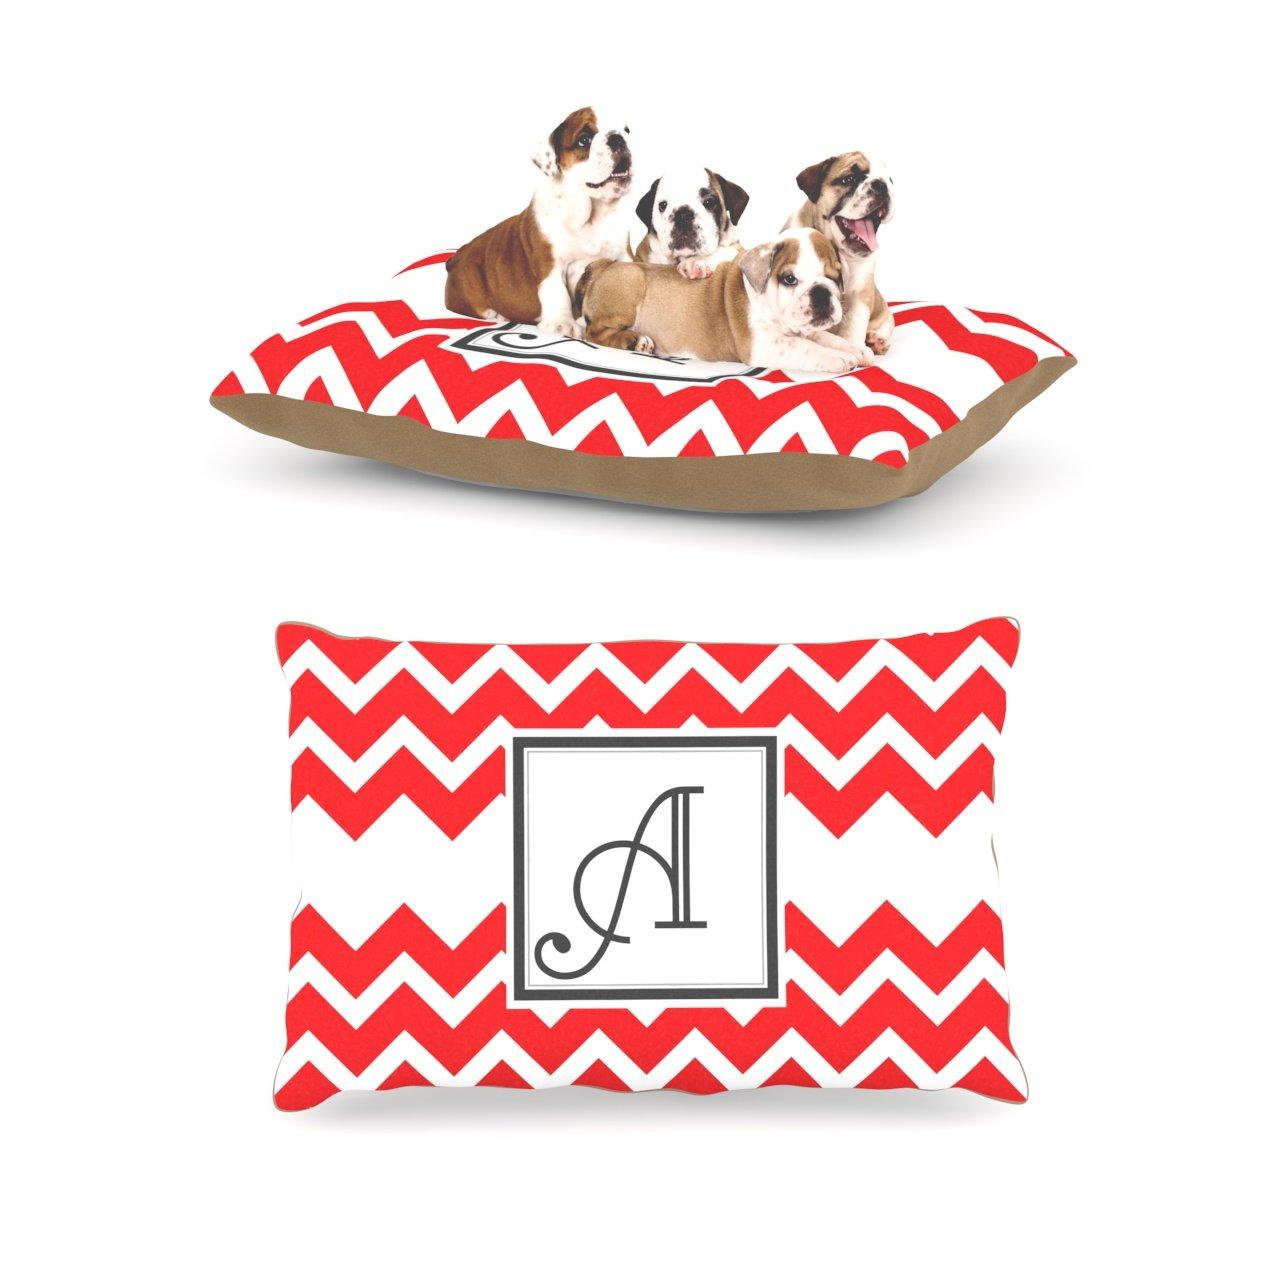 A Large 30  x 40 Kess InHouse Chevron Red Fleece Dog Bed, 30 by 40Inch, Monogram LetterU